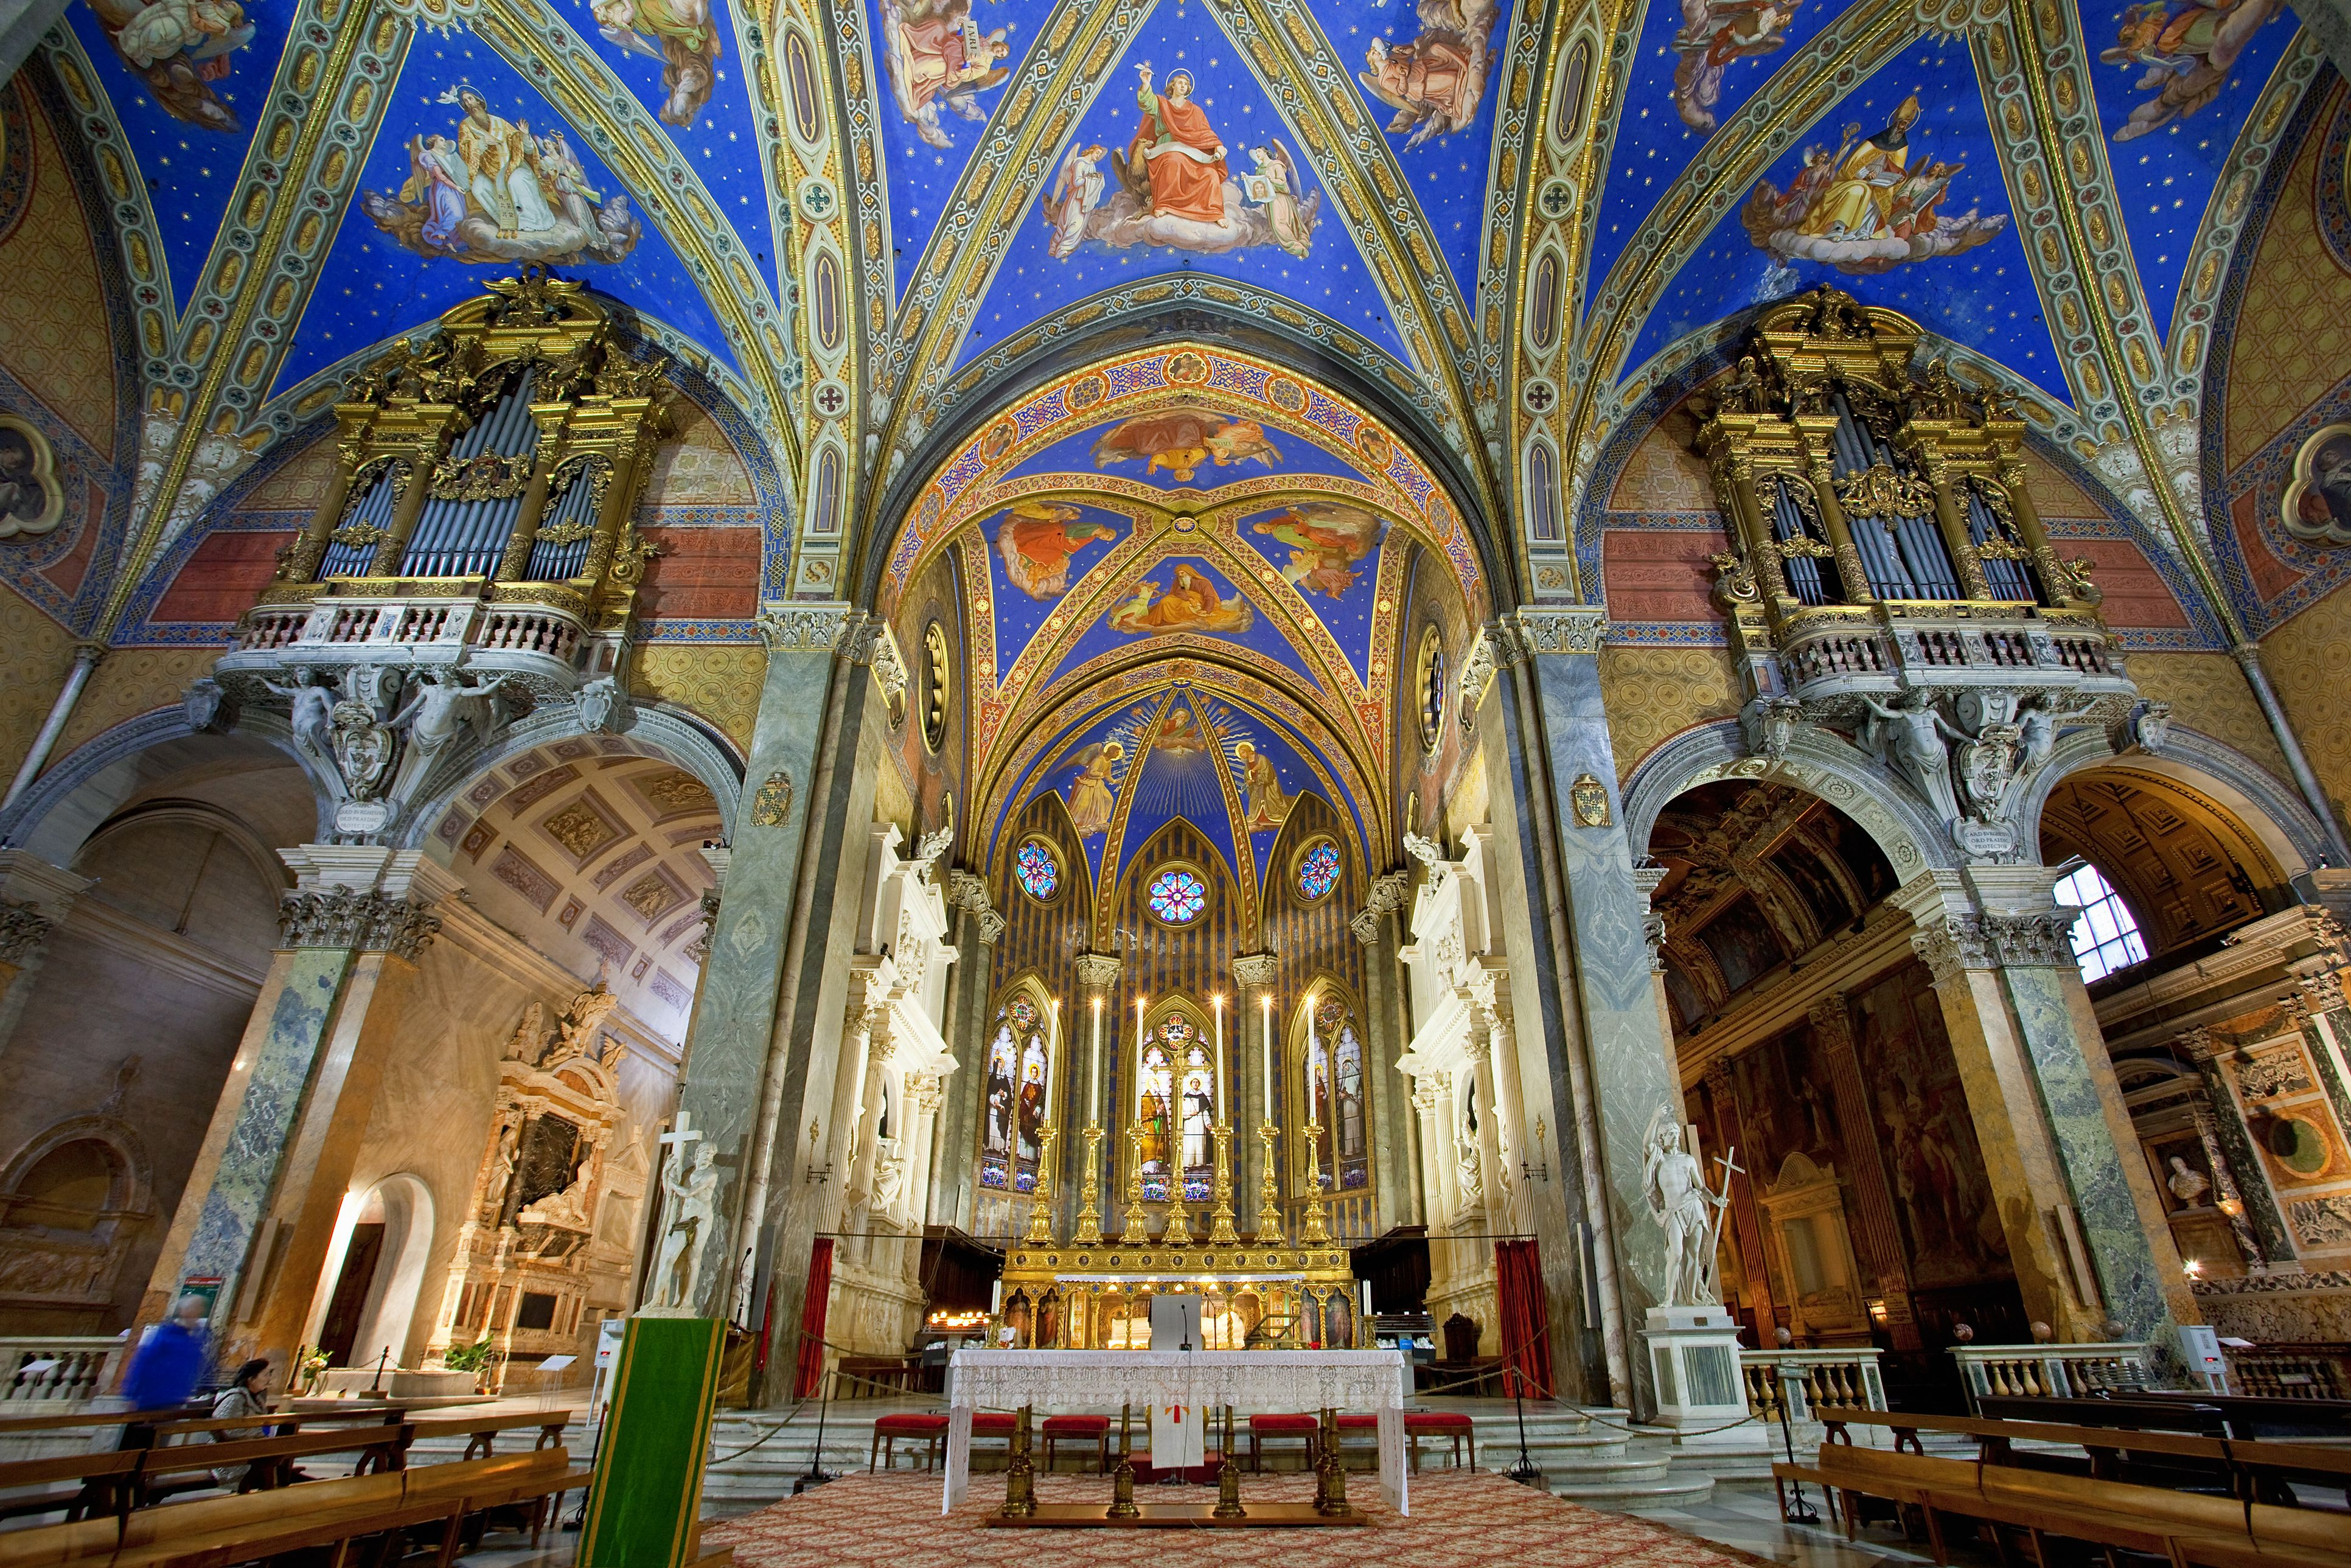 Nave en la iglesia de Santa Maria Sopra Minerva